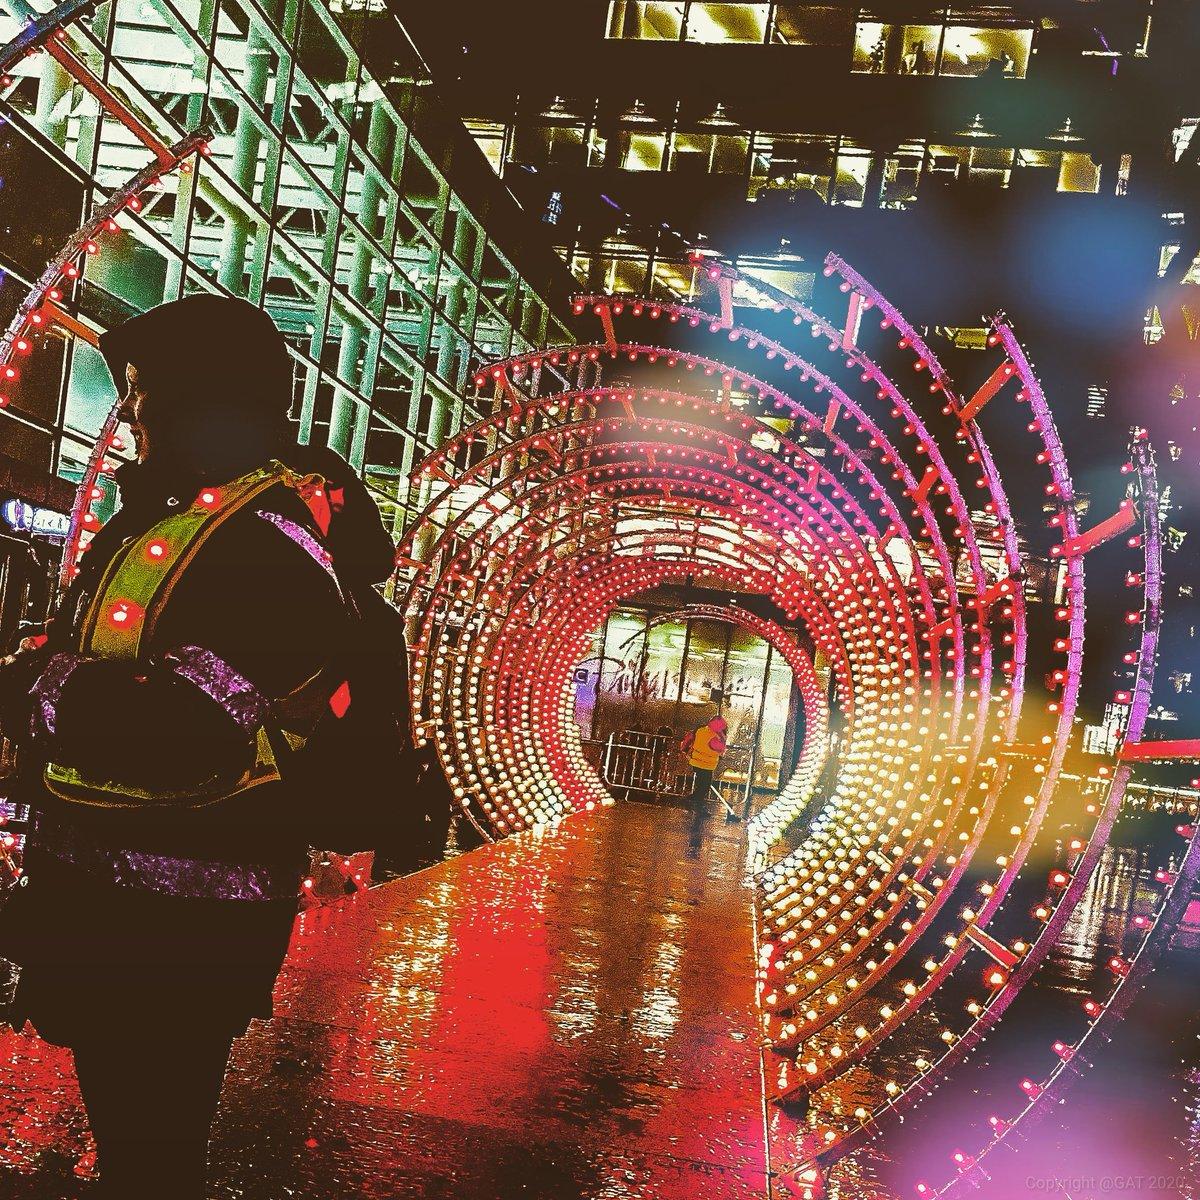 #lightwaves2019 #installationart #nightscape #creativelightingphotography #silhouettephotography #availablelightphotography #nightscenes #photography #PHOTOS #nightphotographerpic.twitter.com/JowHTTGmP6